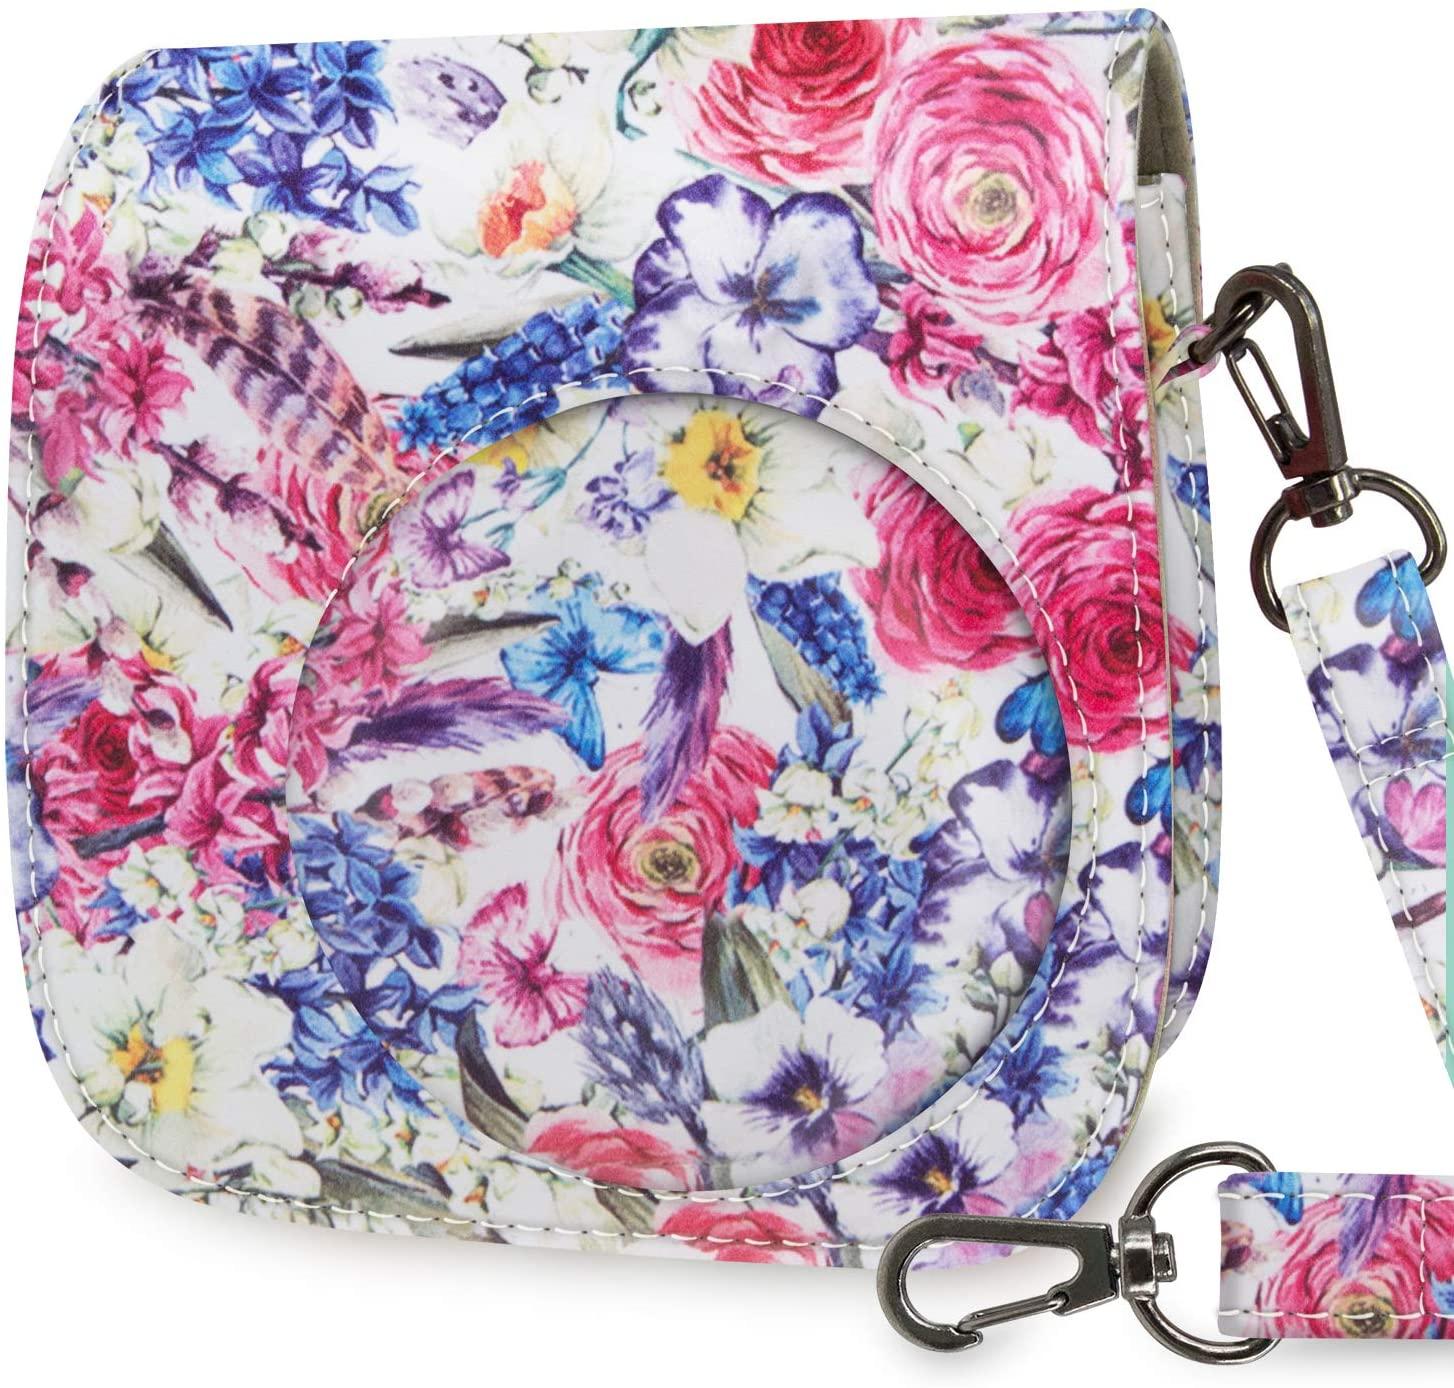 WOLVEN Protective Case Bag Purse Compatible with Mini 9 / Mini 8 / Mini 8+ Instant Camera (Colorful Flower)